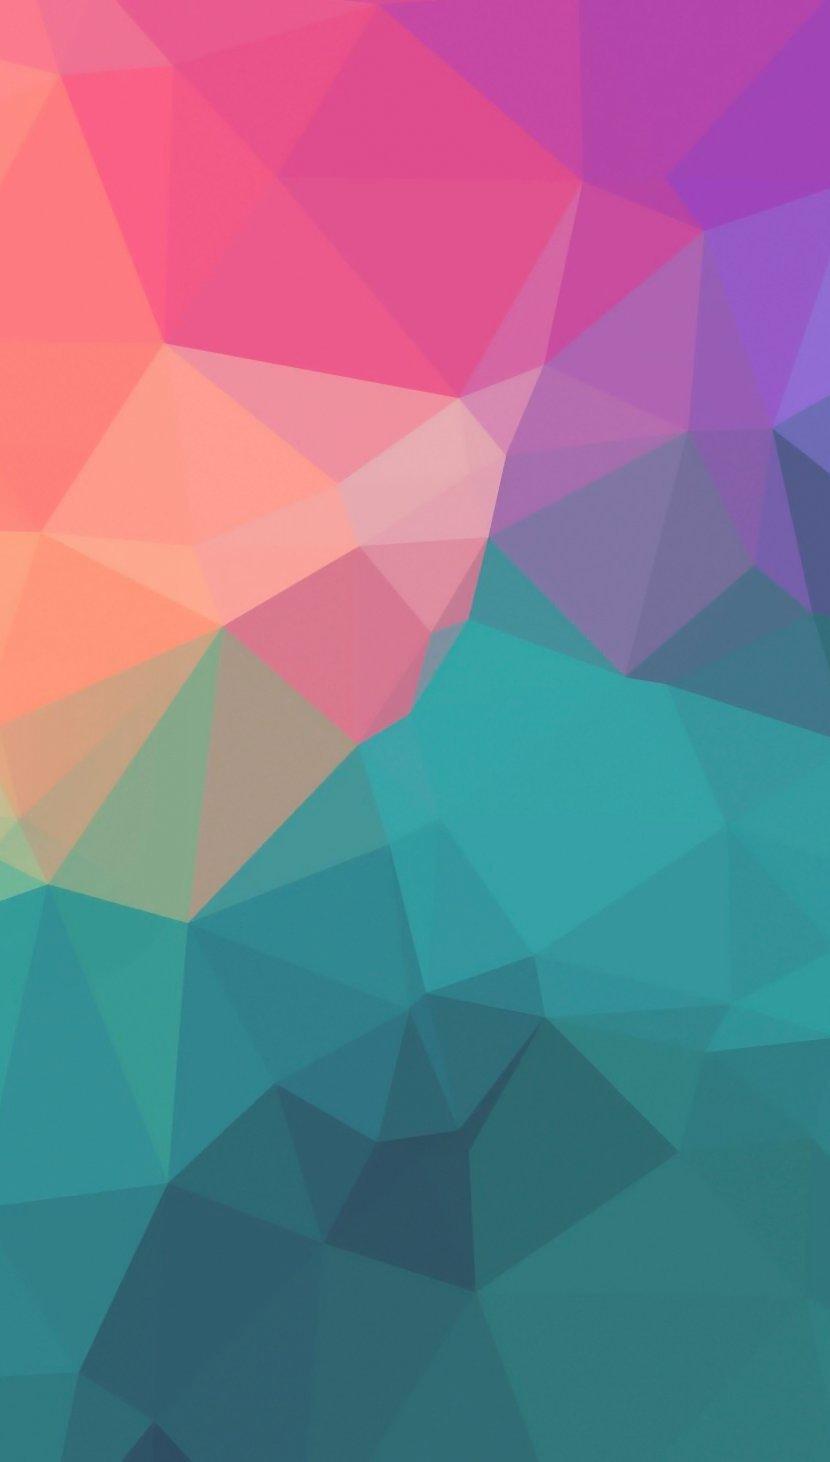 Fondos de pantalla Polígonos de colores Vertical